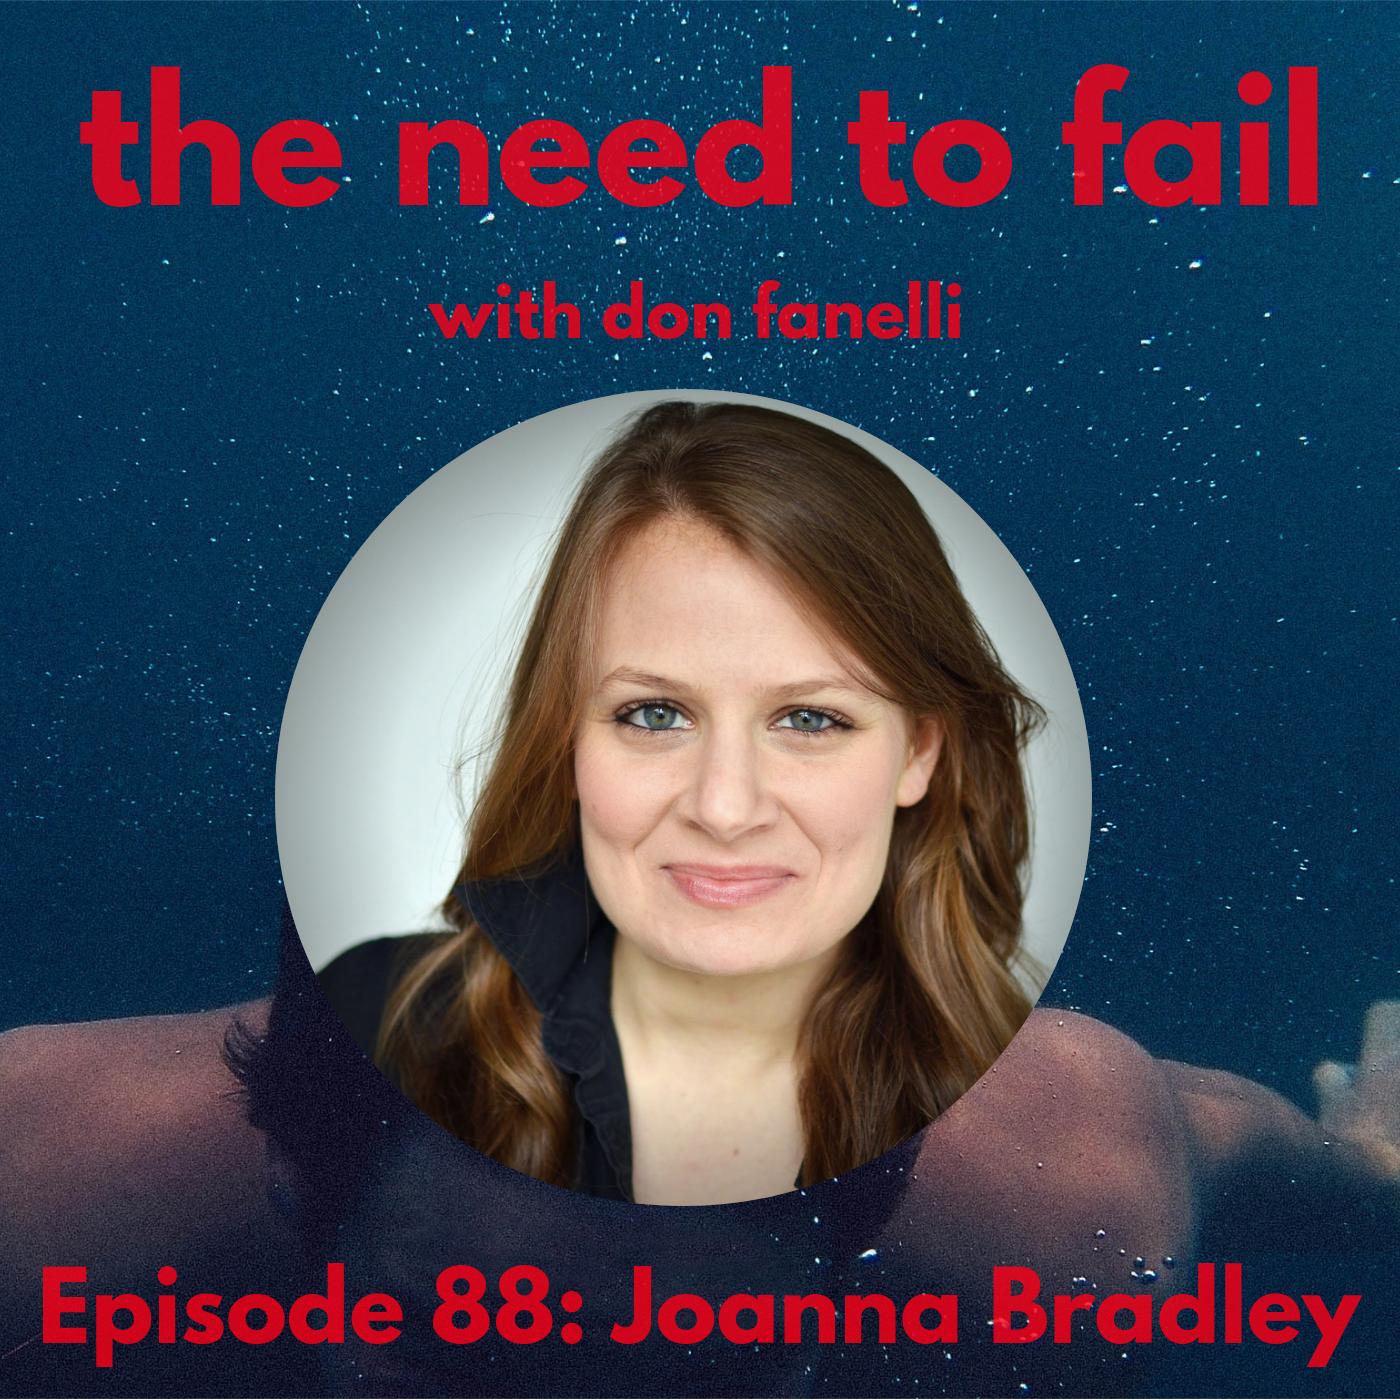 Episode 88: Joanna Bradley